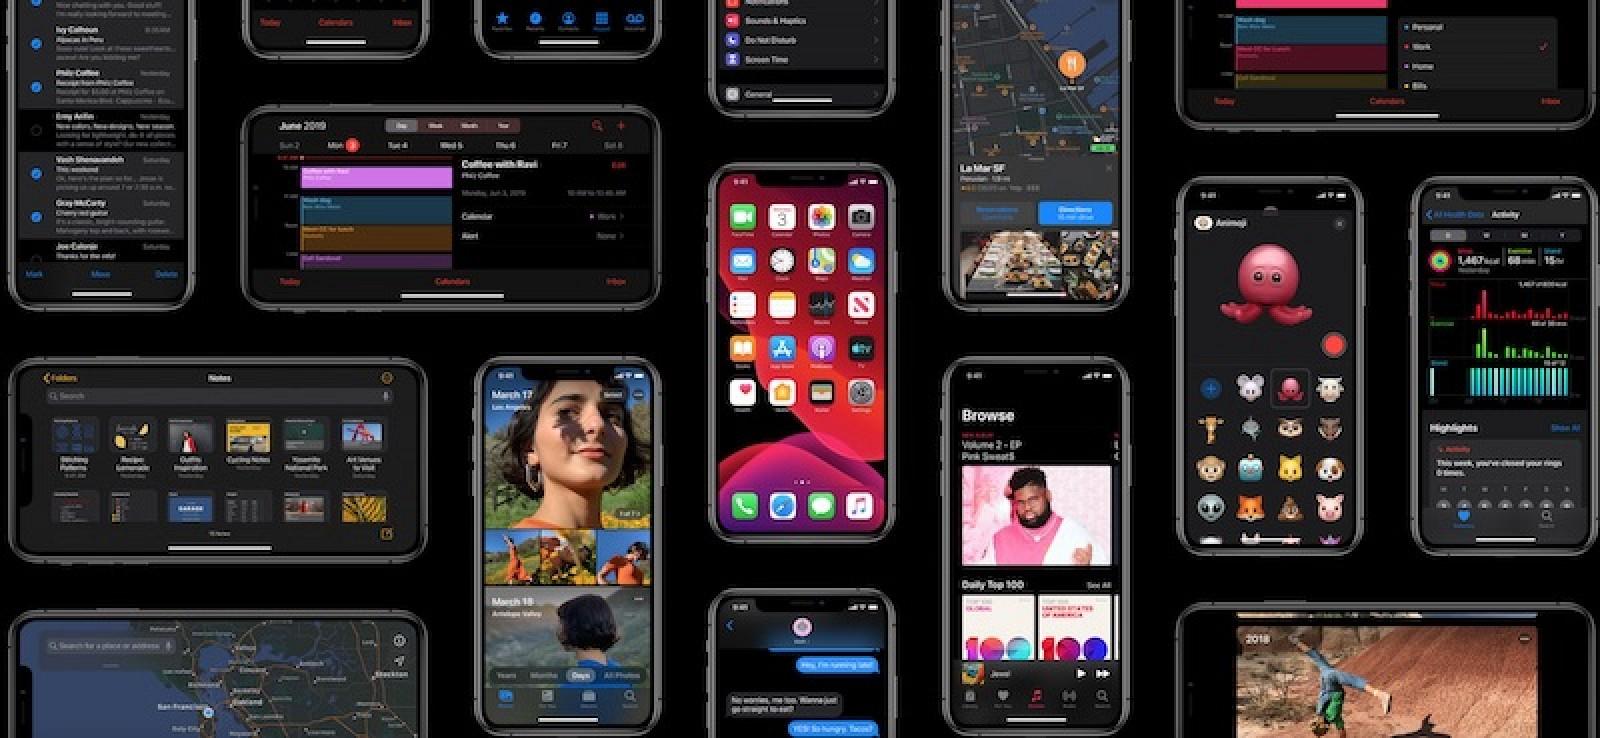 How to Enable Dark Mode in iOS 13 - MacRumors